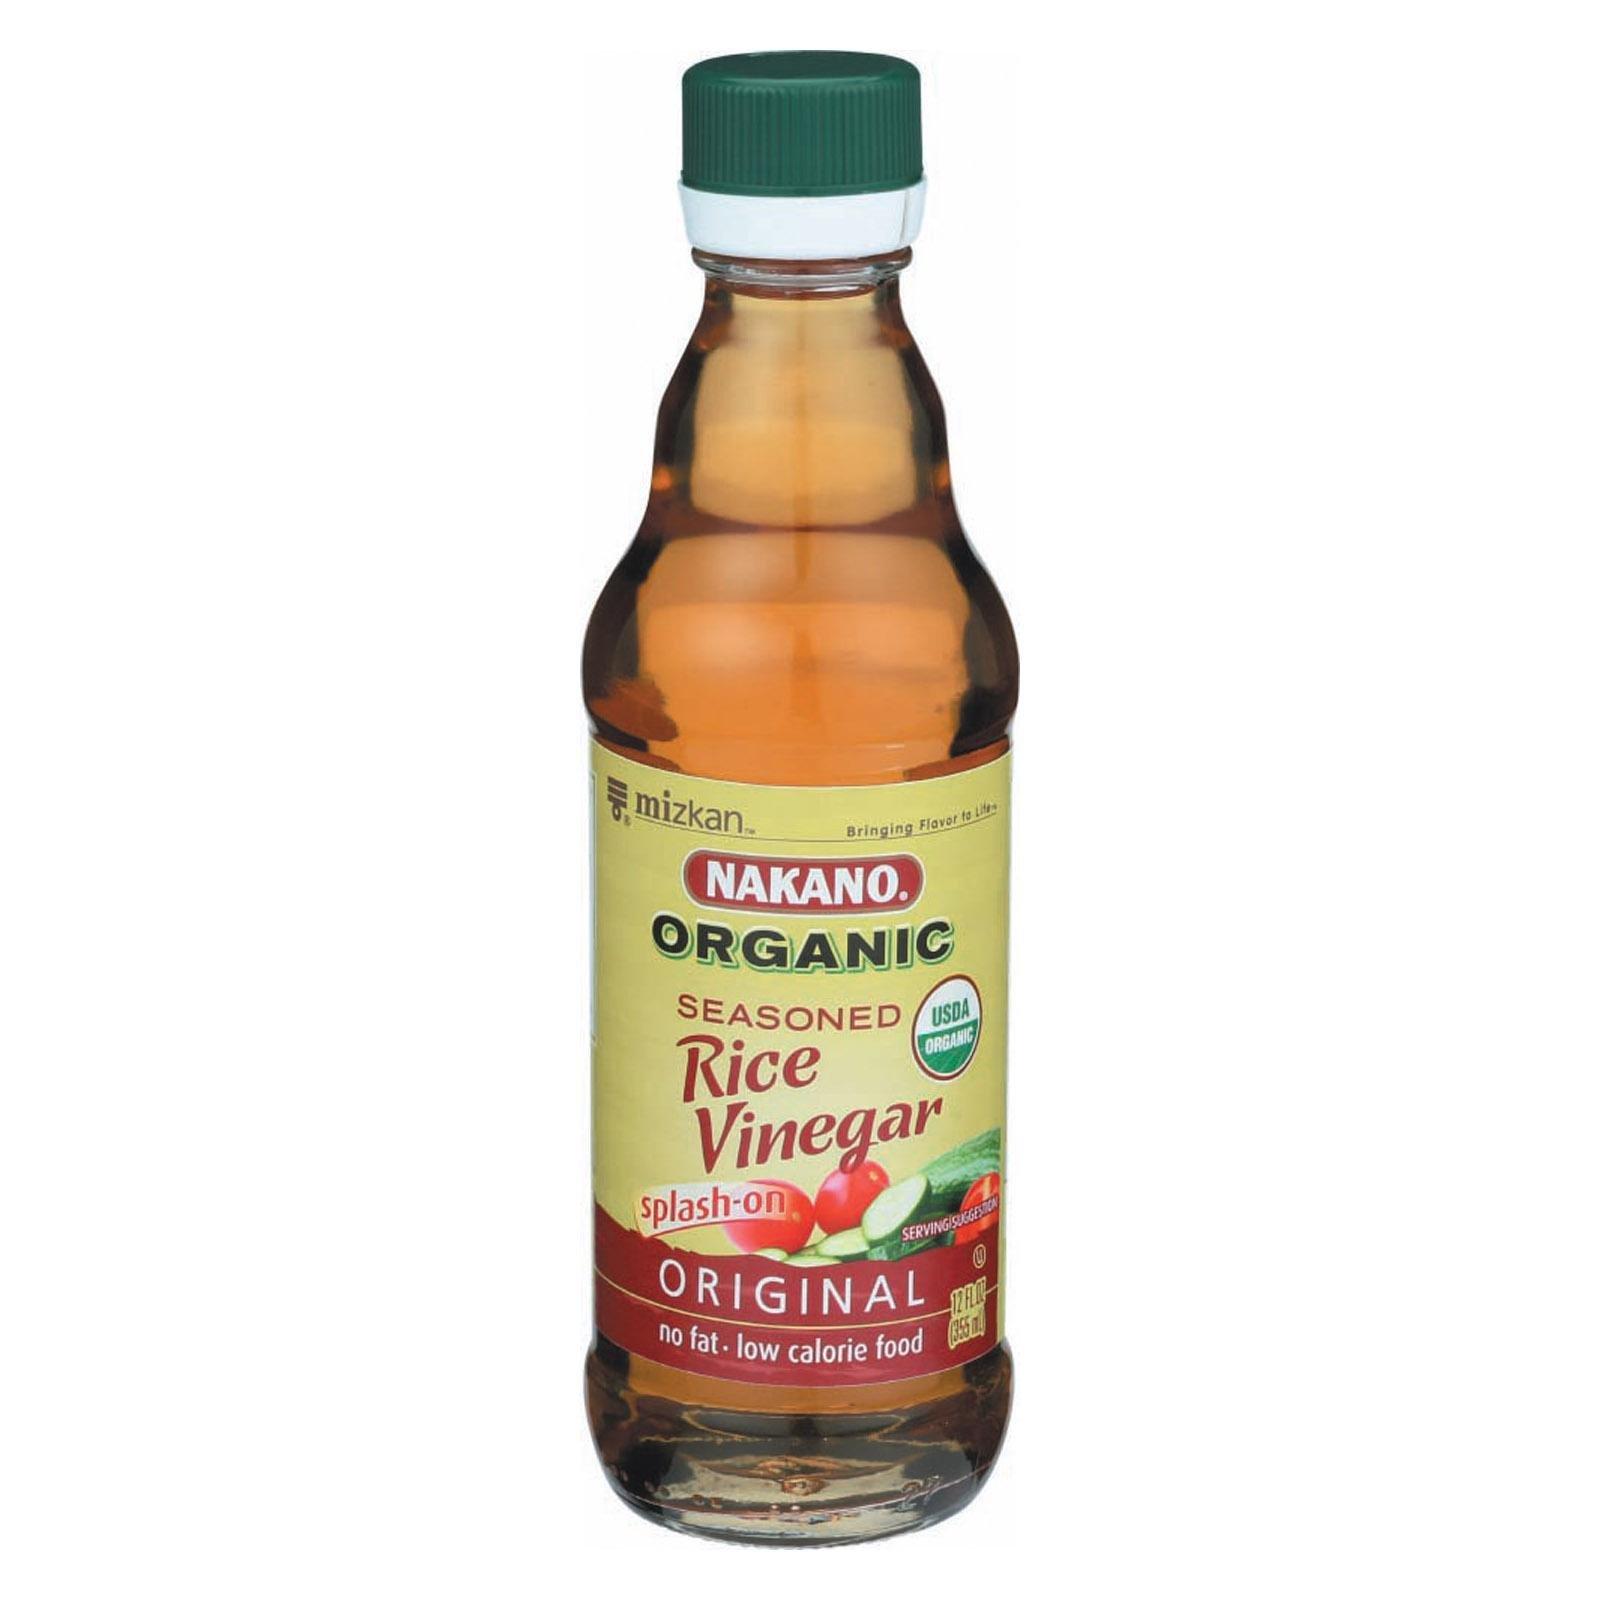 Nakano Vinegar Rice Seasoned Organic, 12 oz